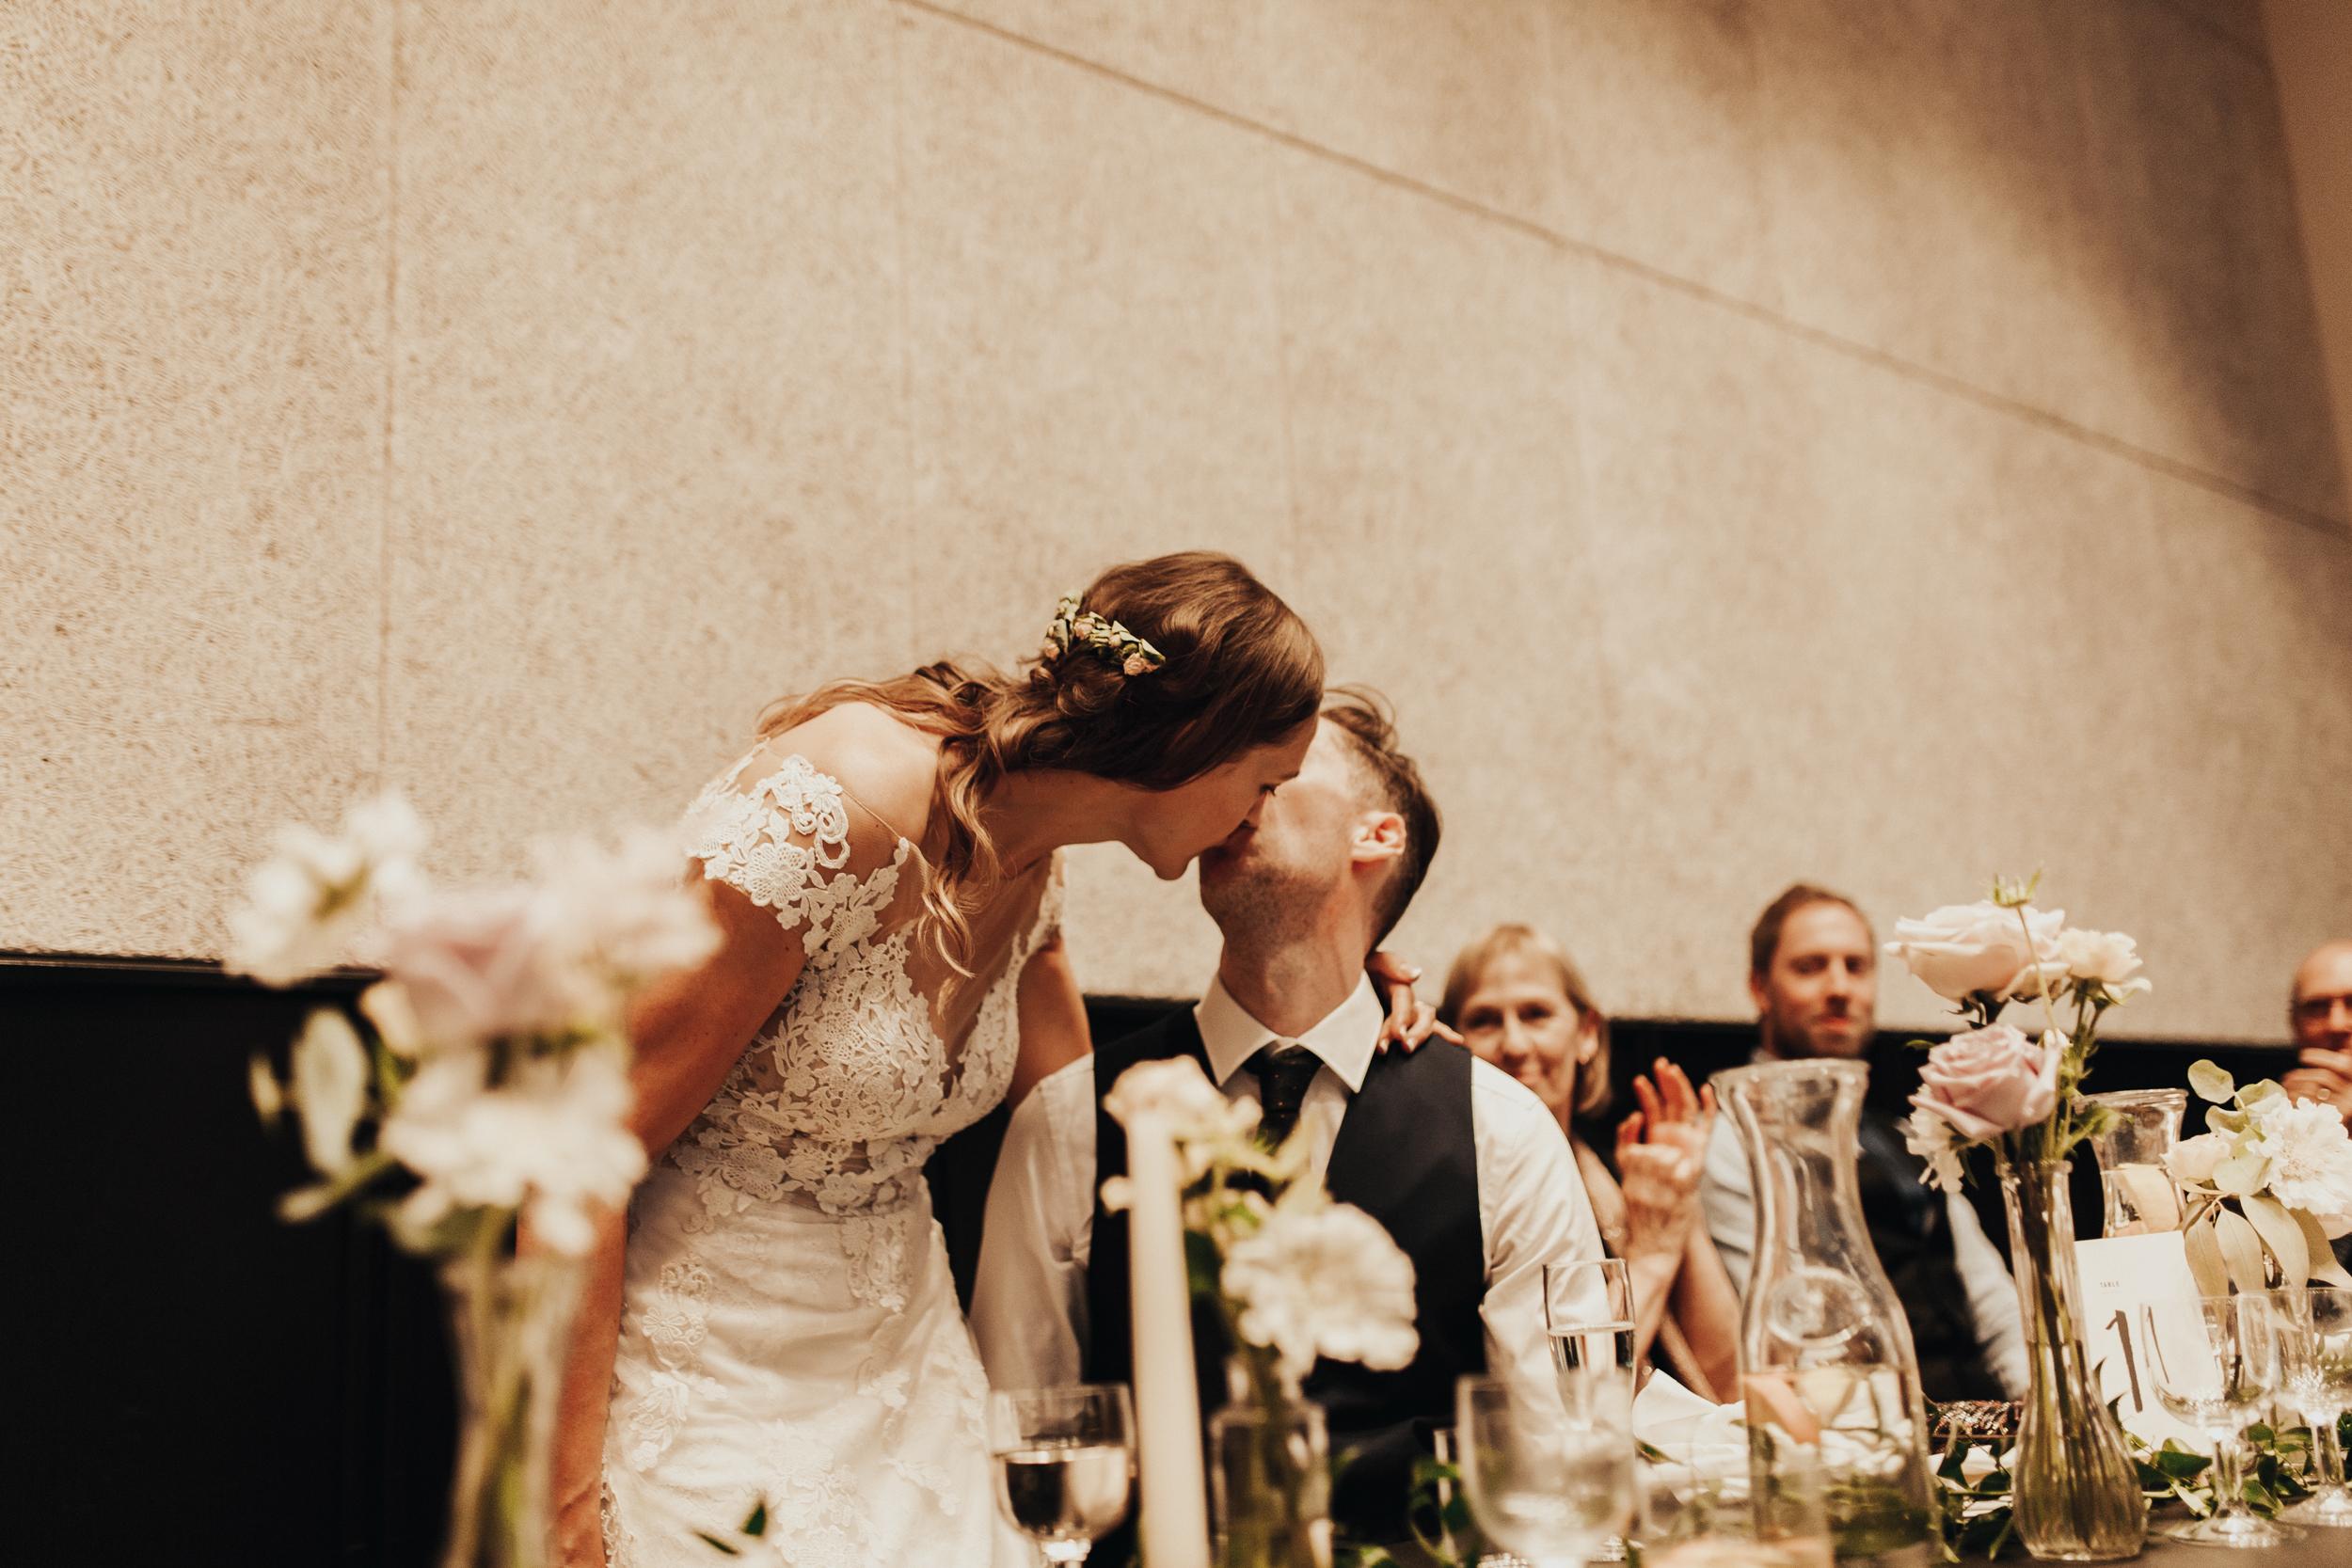 Laura-Benn-The-Asylum-London-The-Ace-Hotel-Wedding-Alternative-Darina-Stoda-Photography-782.jpg